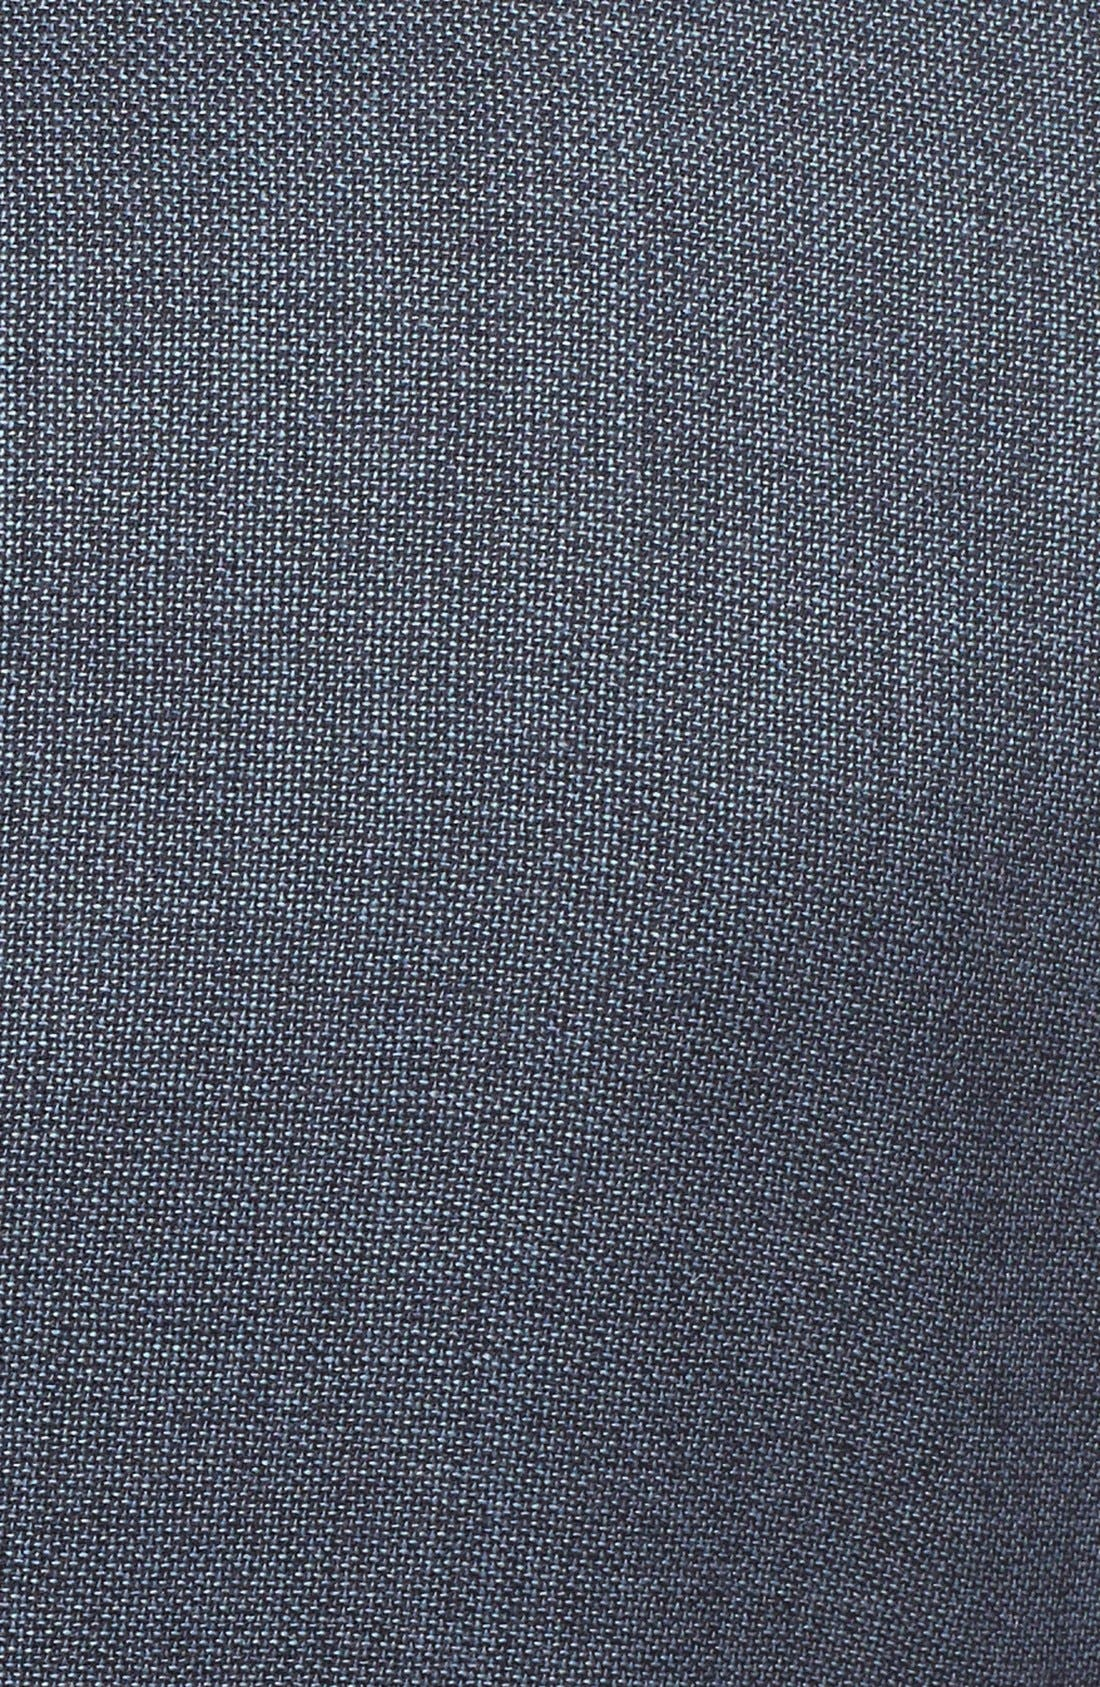 Alternate Image 3  - BOSS HUGO BOSS 'Hutson' Trim Fit Wool Blazer